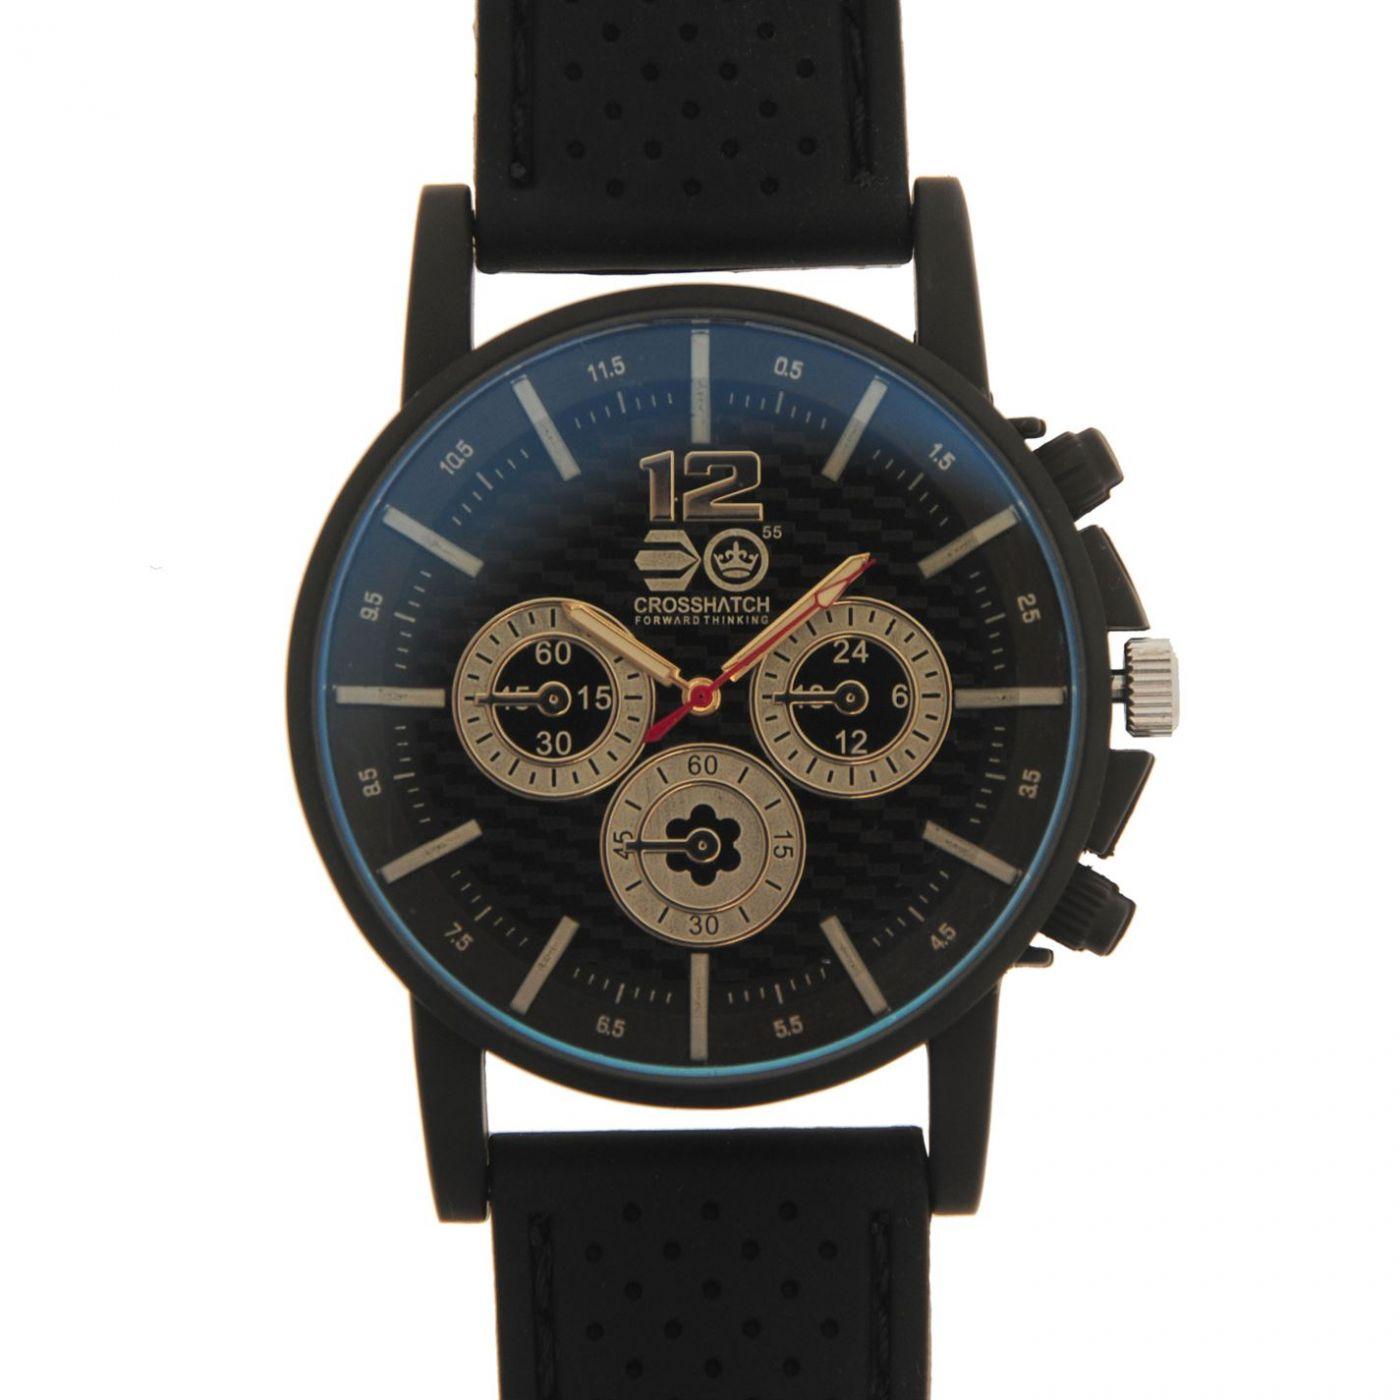 Crosshatch Chequered Rubber Strap Watch Mens